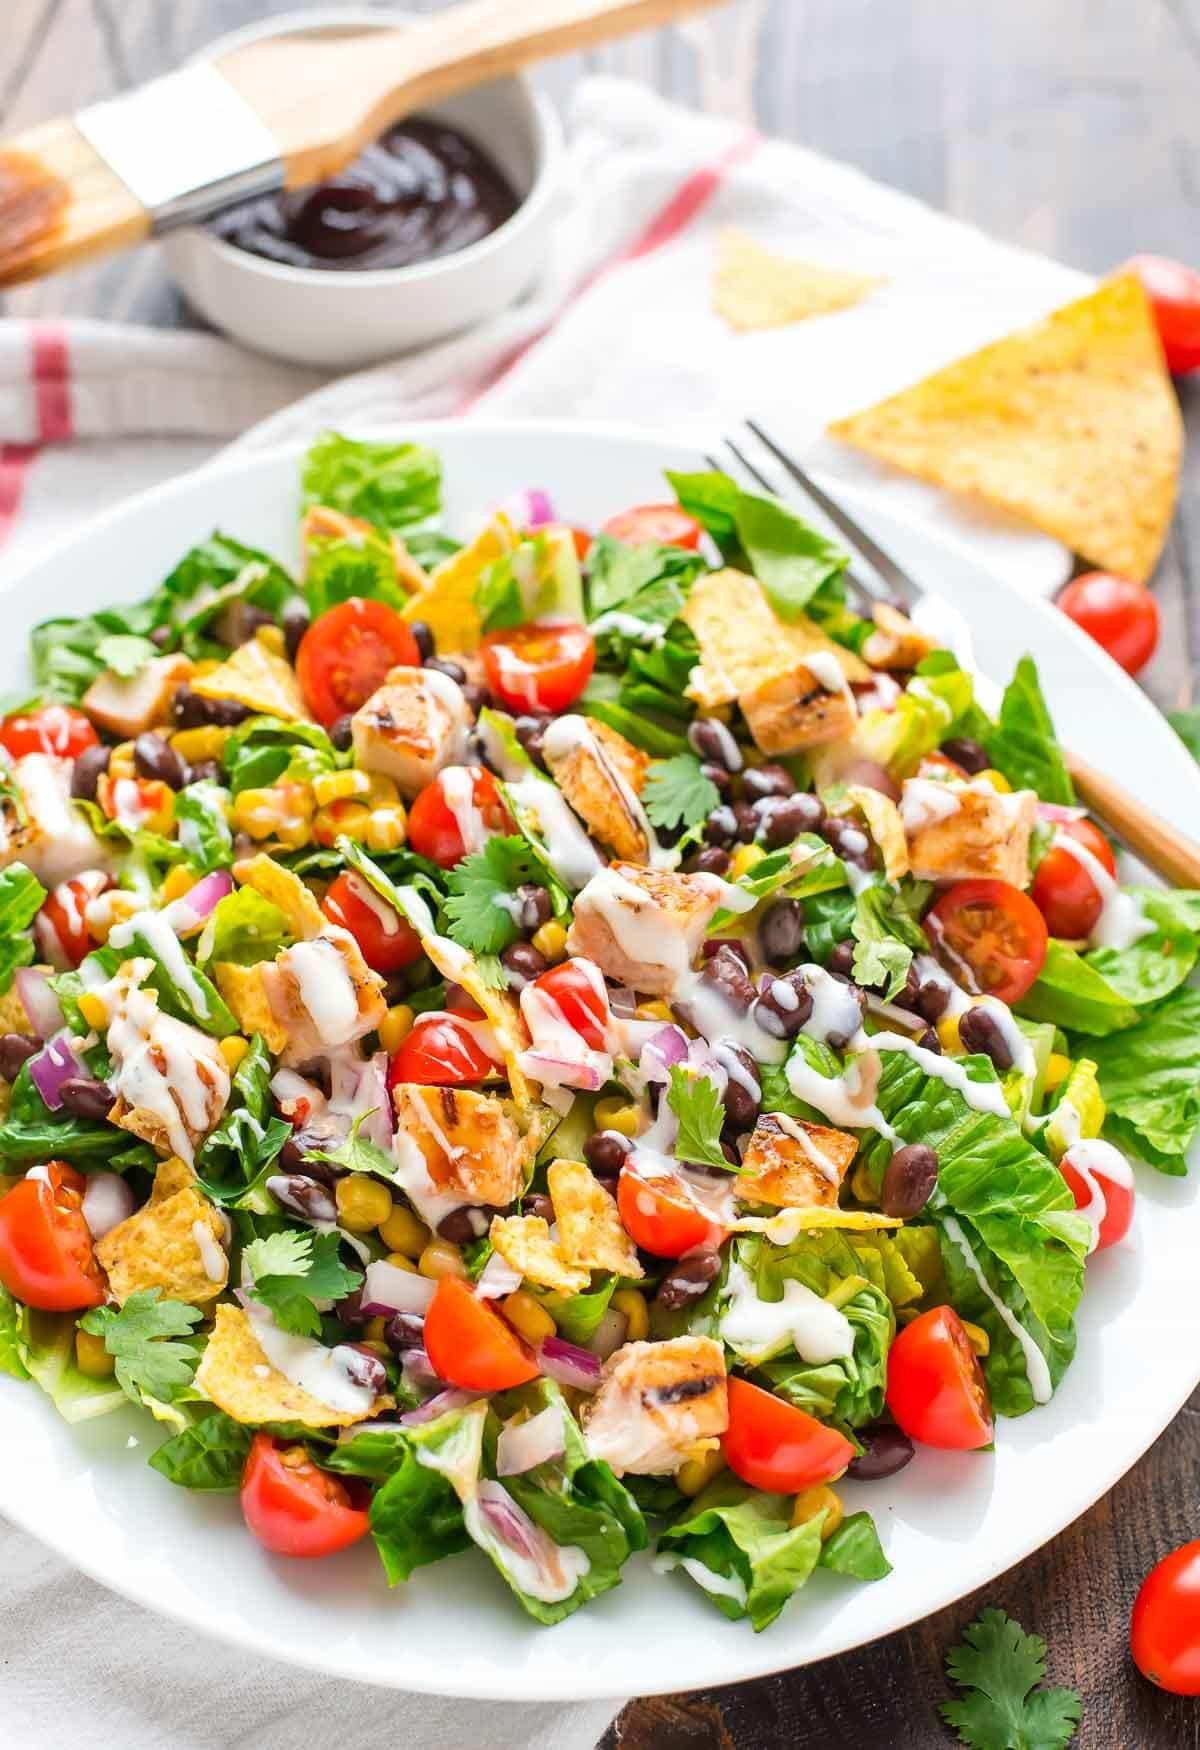 Chicken Salad Healthy  BBQ Chicken Salad with Creamy Ranch